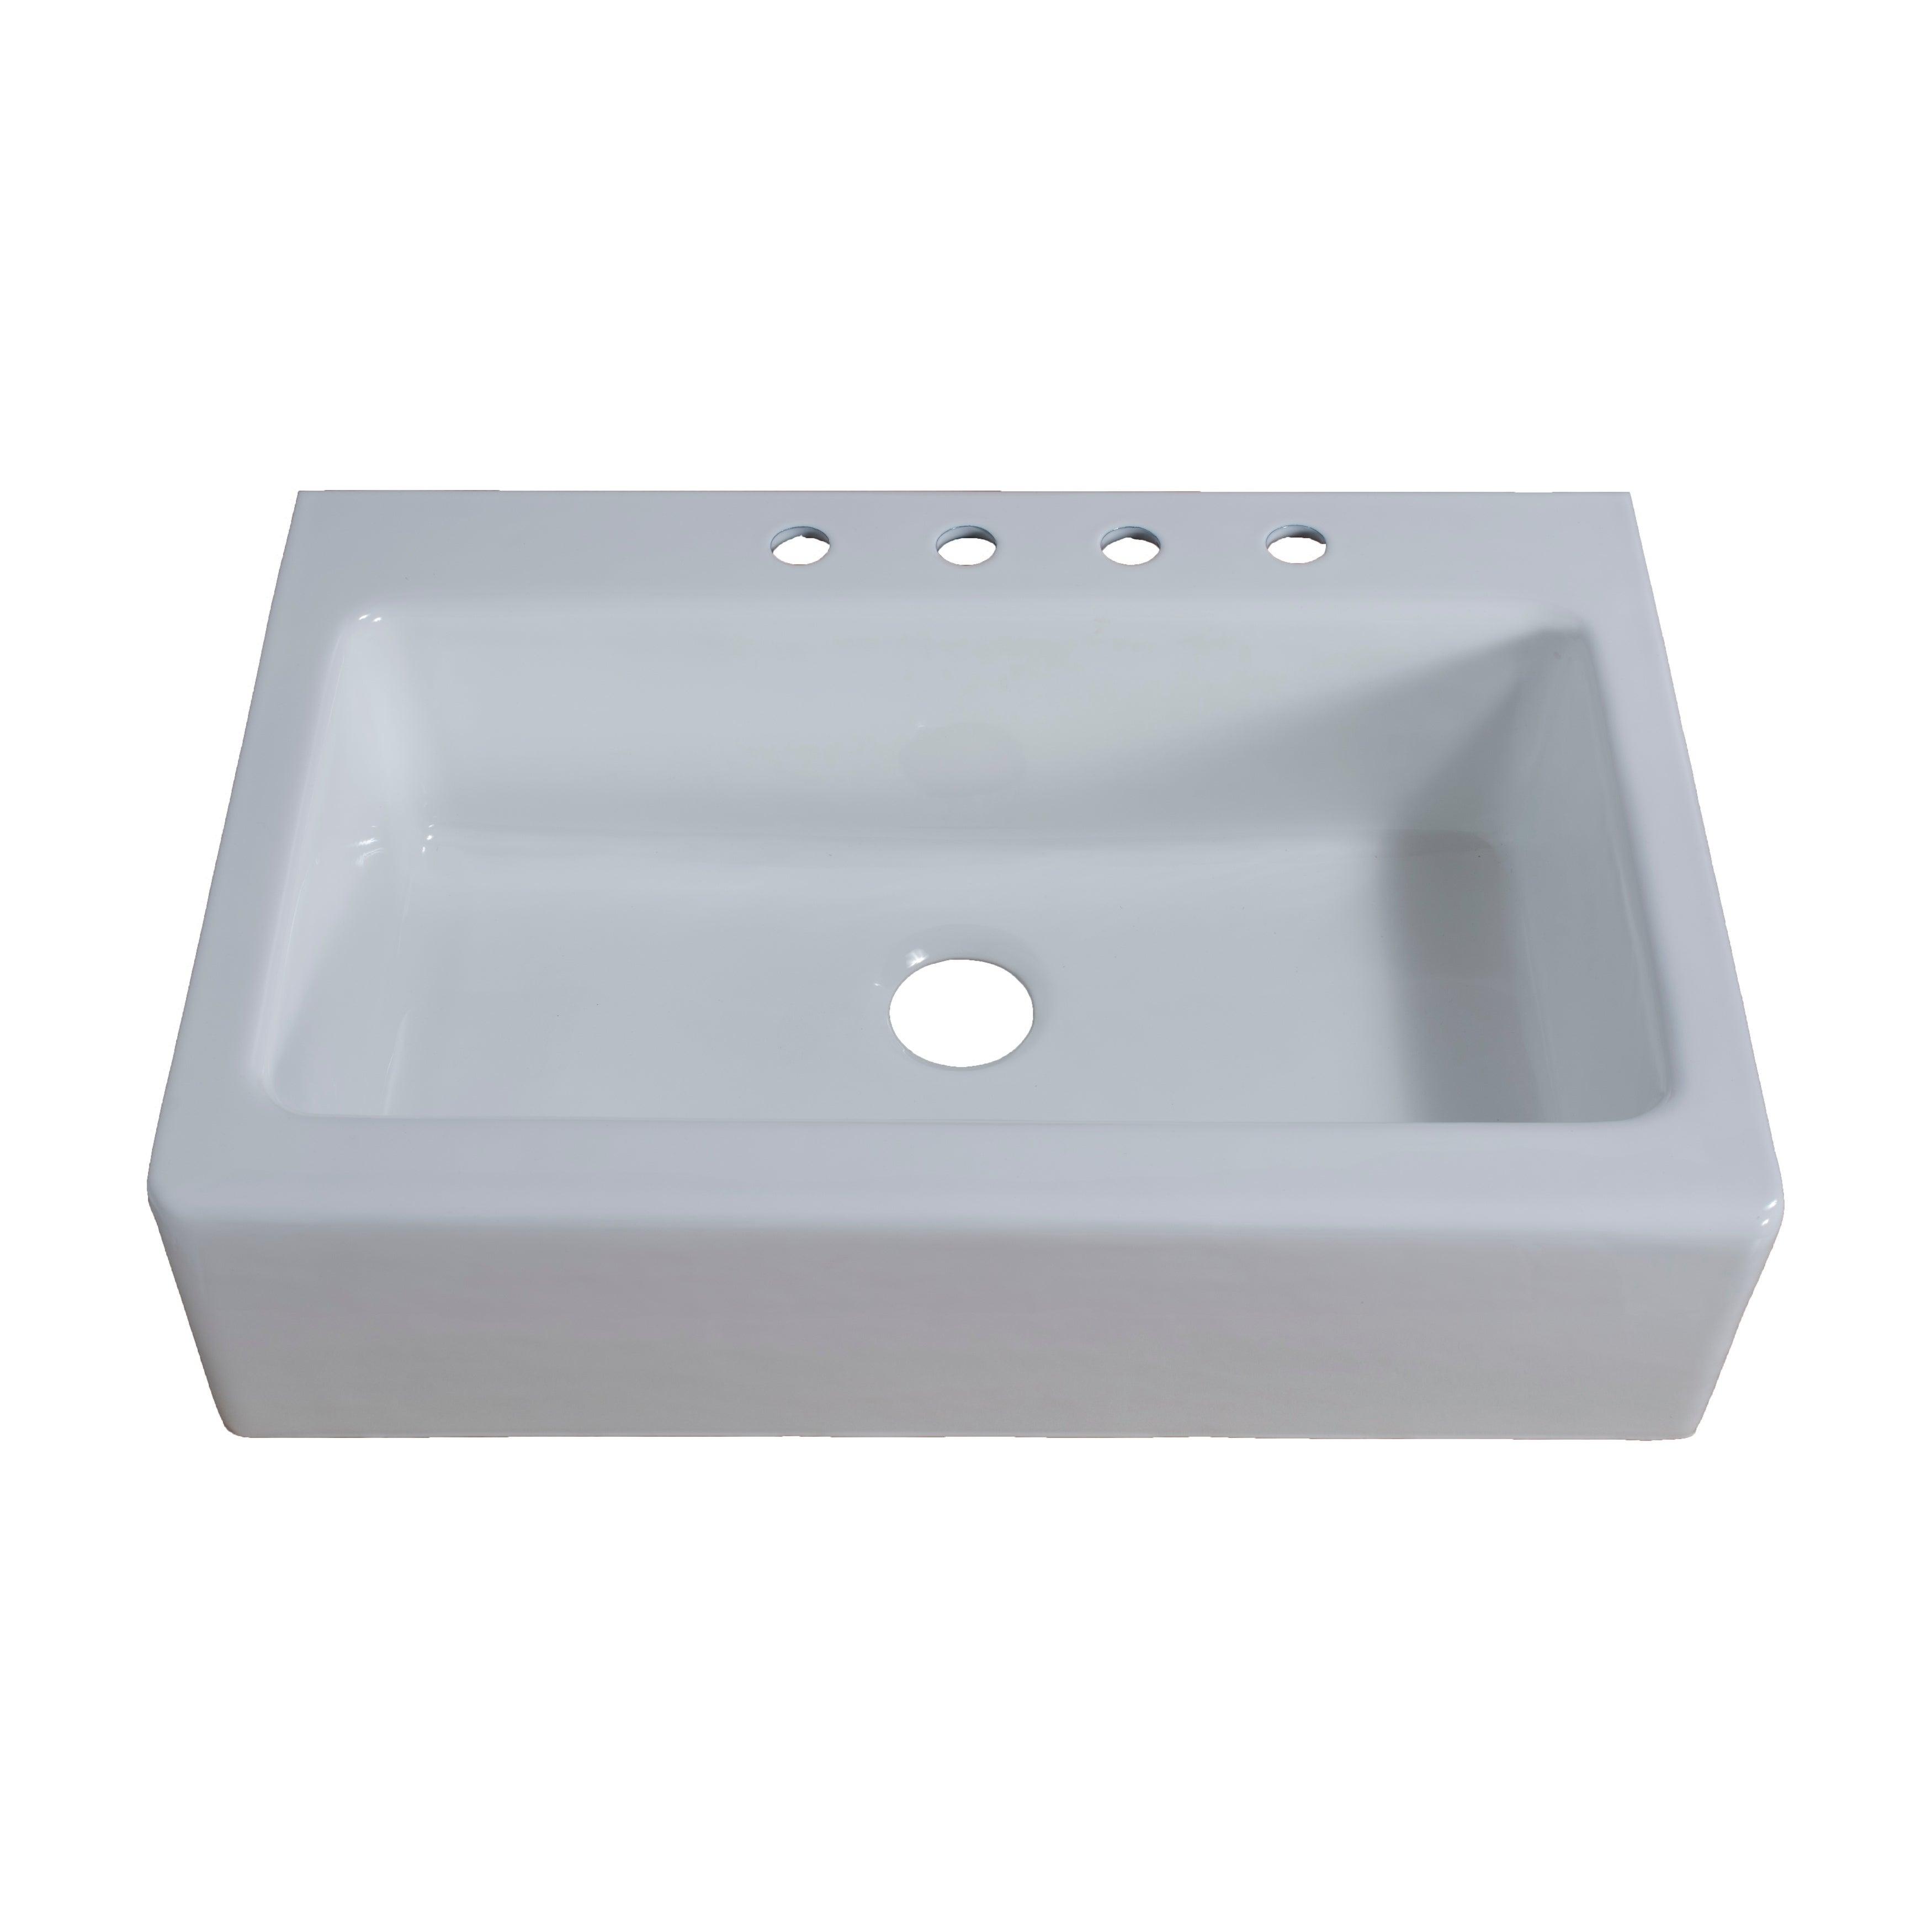 Shop Farmhouse Cast-Iron 33 in. Single Bowl Kitchen Sink - Free ...